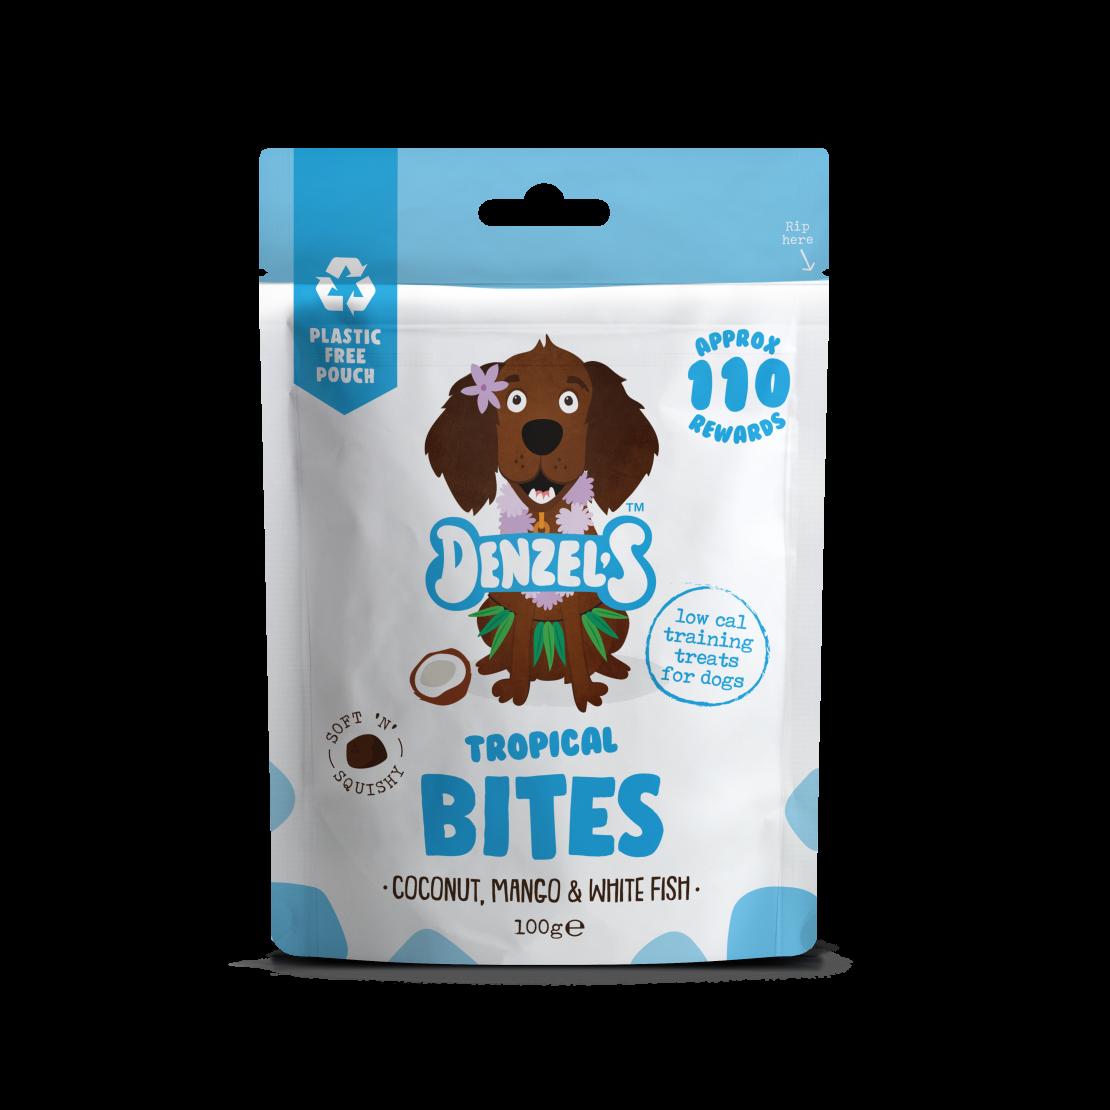 Denzel's Tropical Bites For Dogs Coconut Mango & White Fish 100g